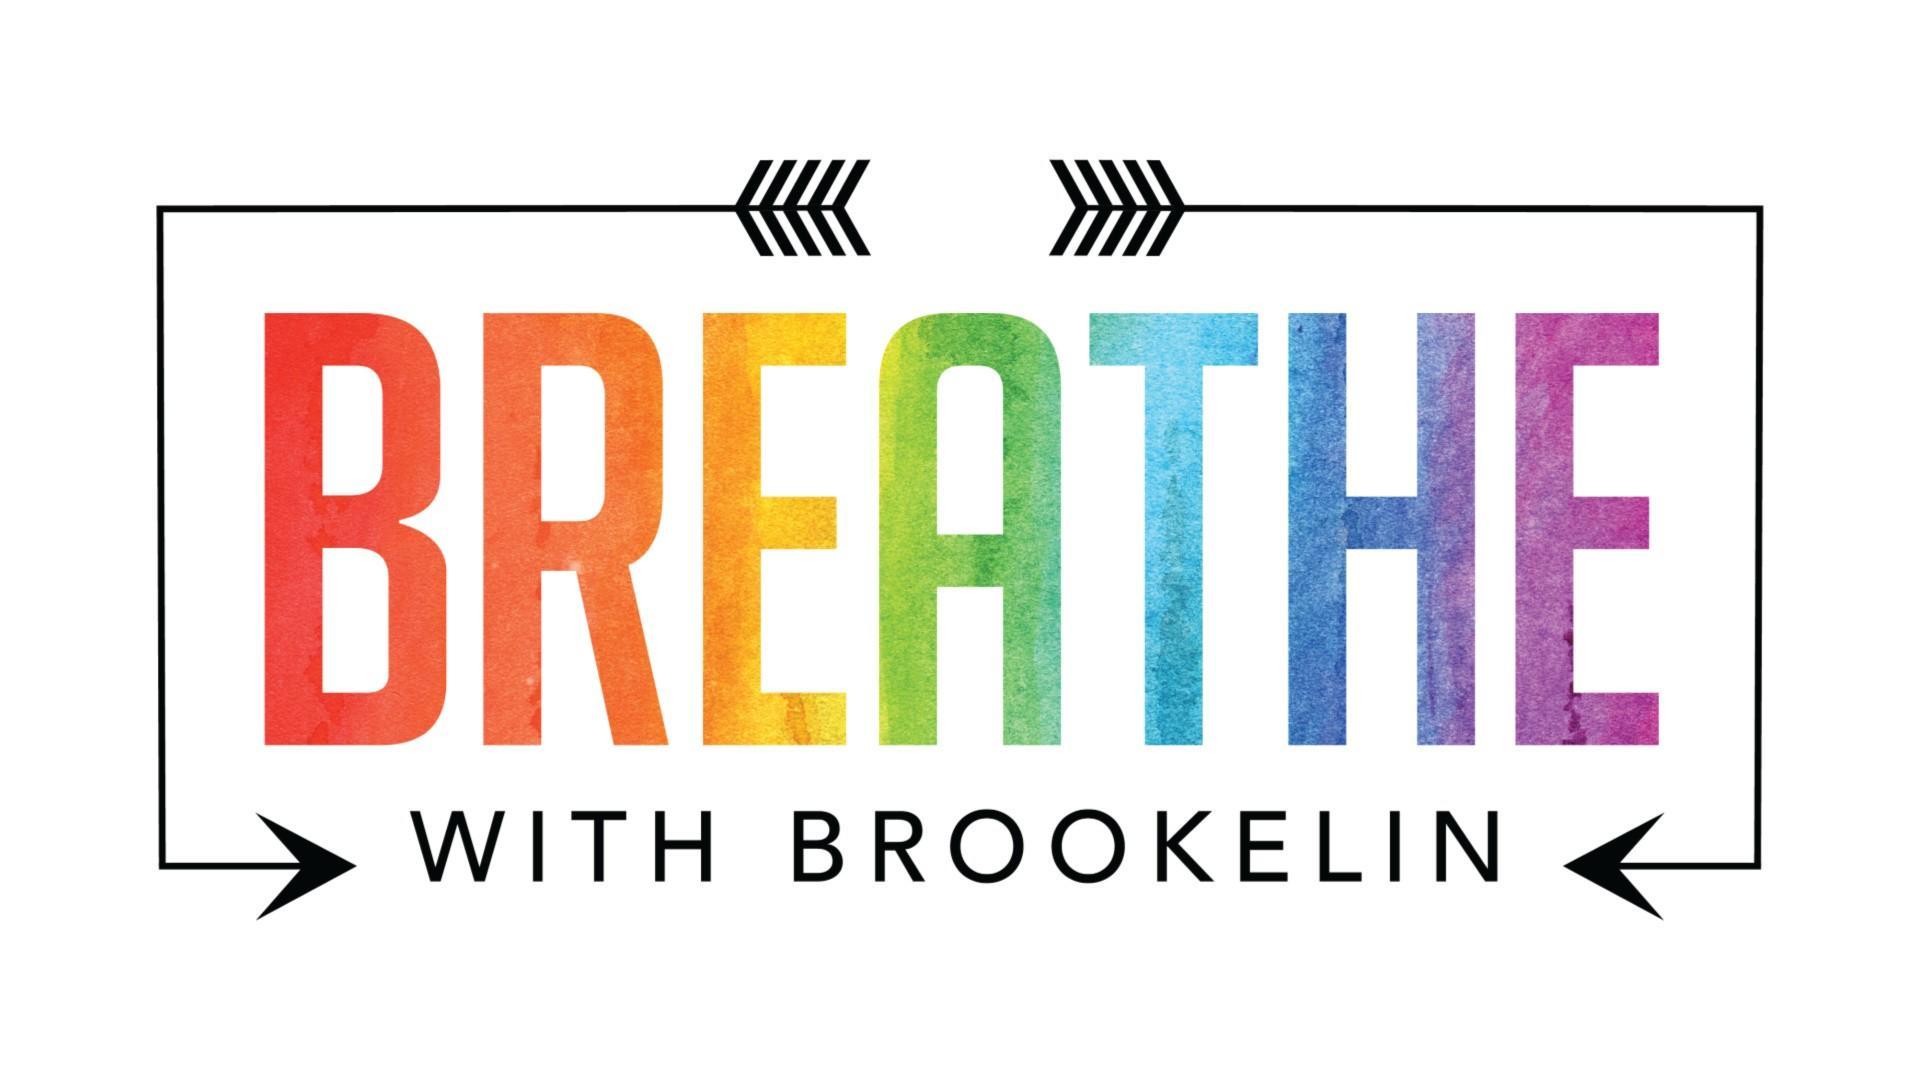 Breathe with Brookelin